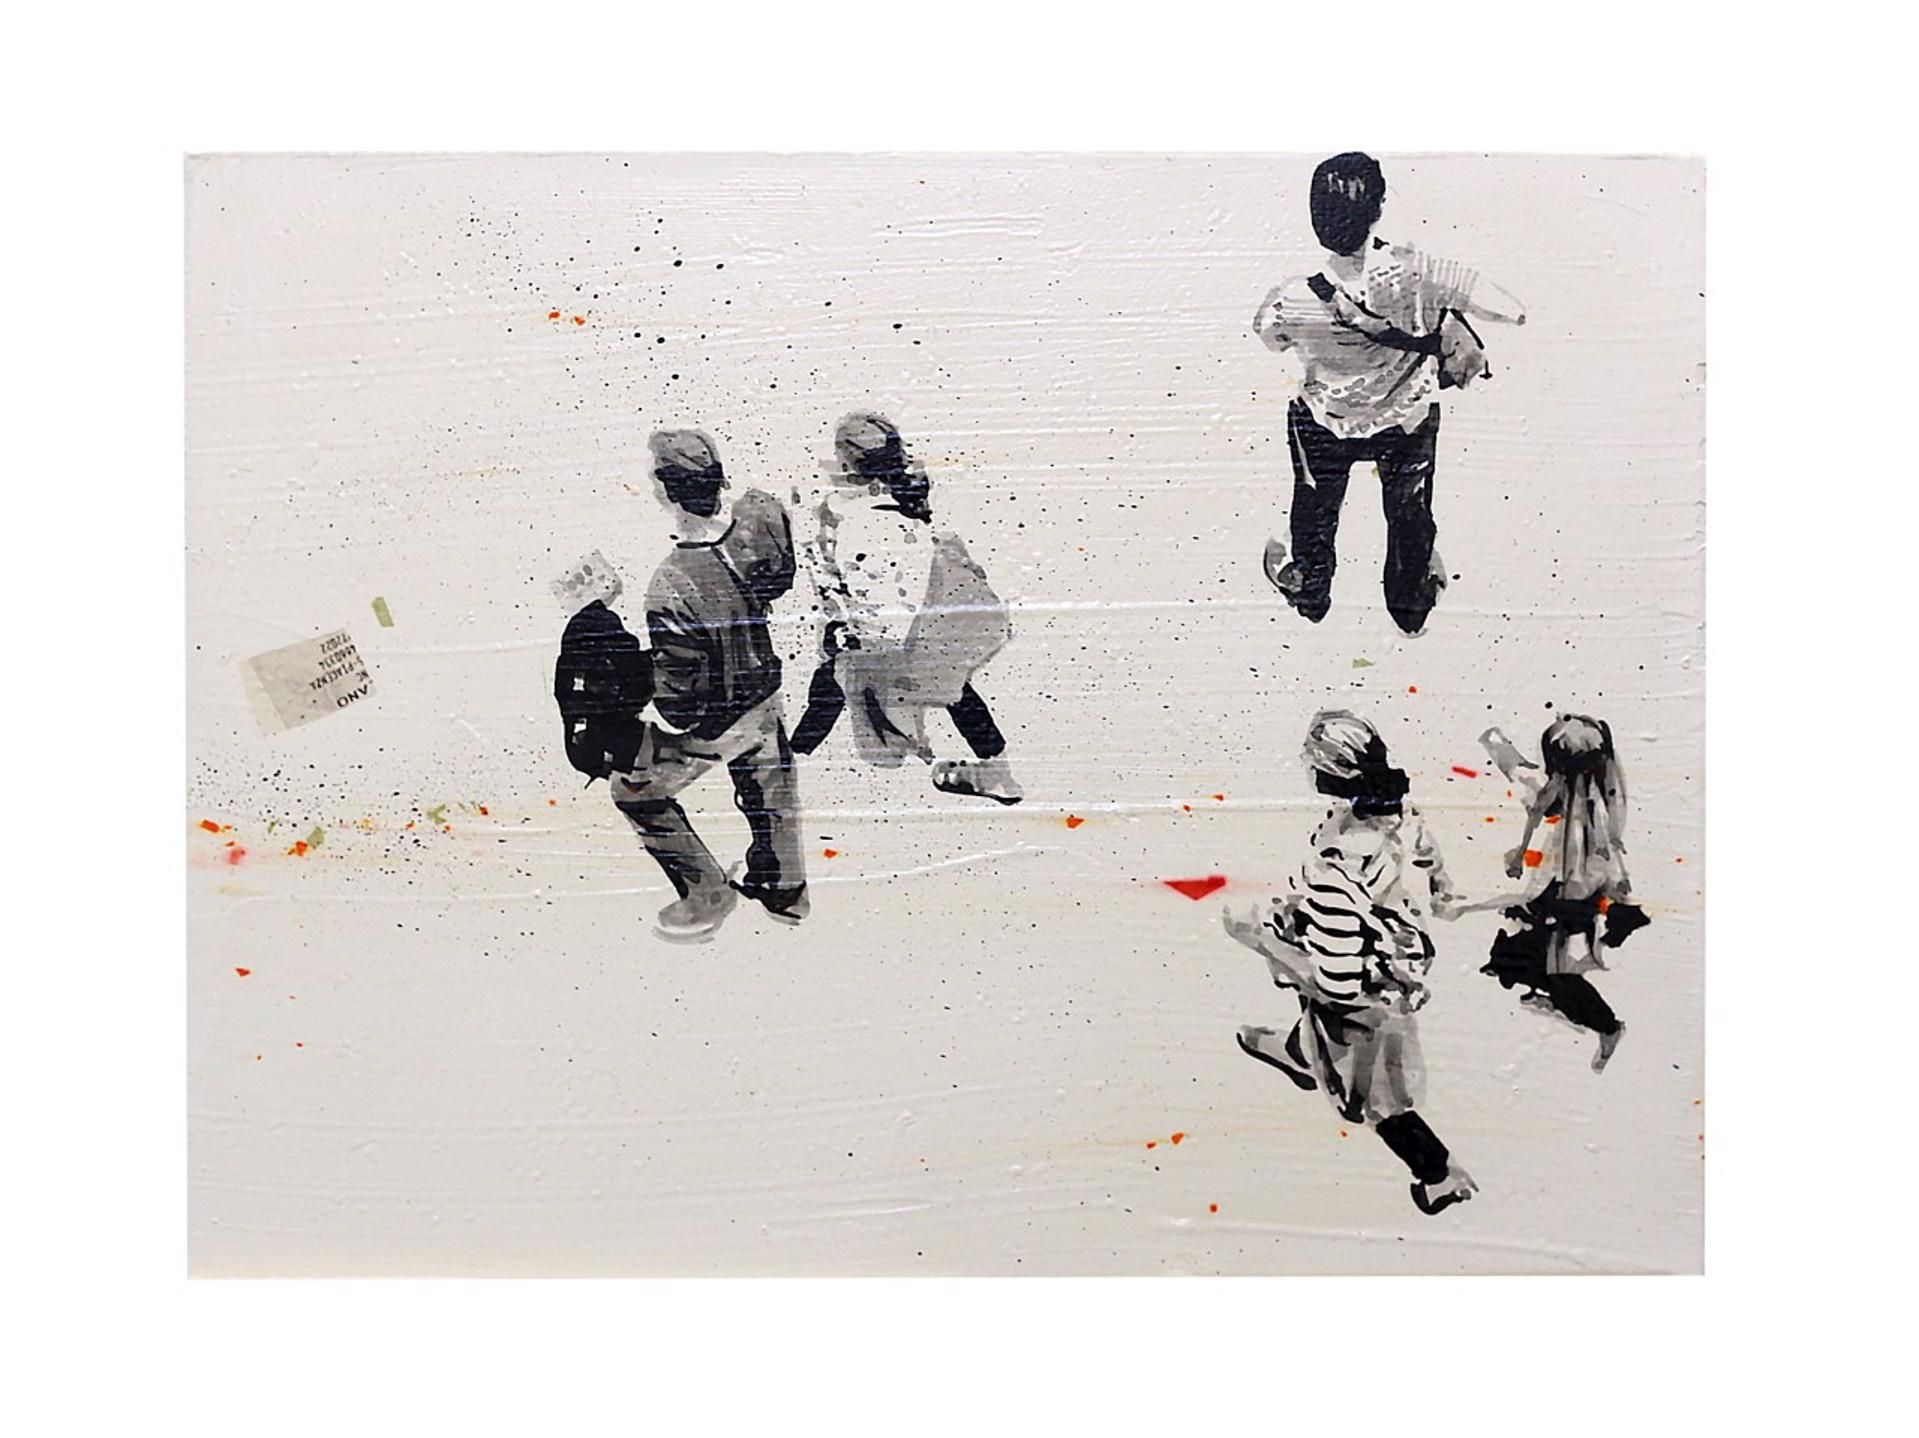 Walking White 2 by Federico Arcuri